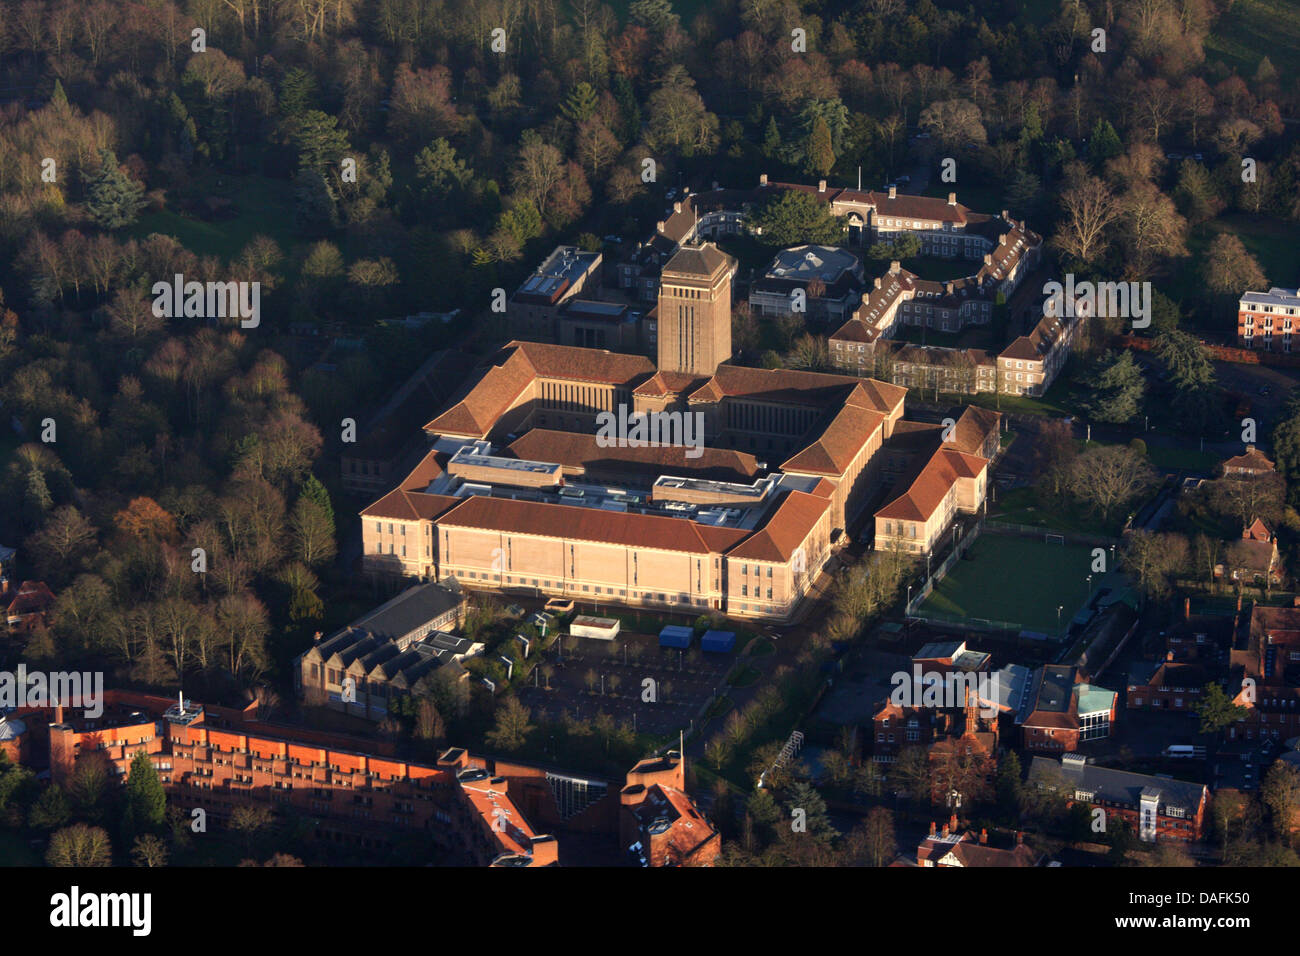 University Library, Cambridge - Stock Image